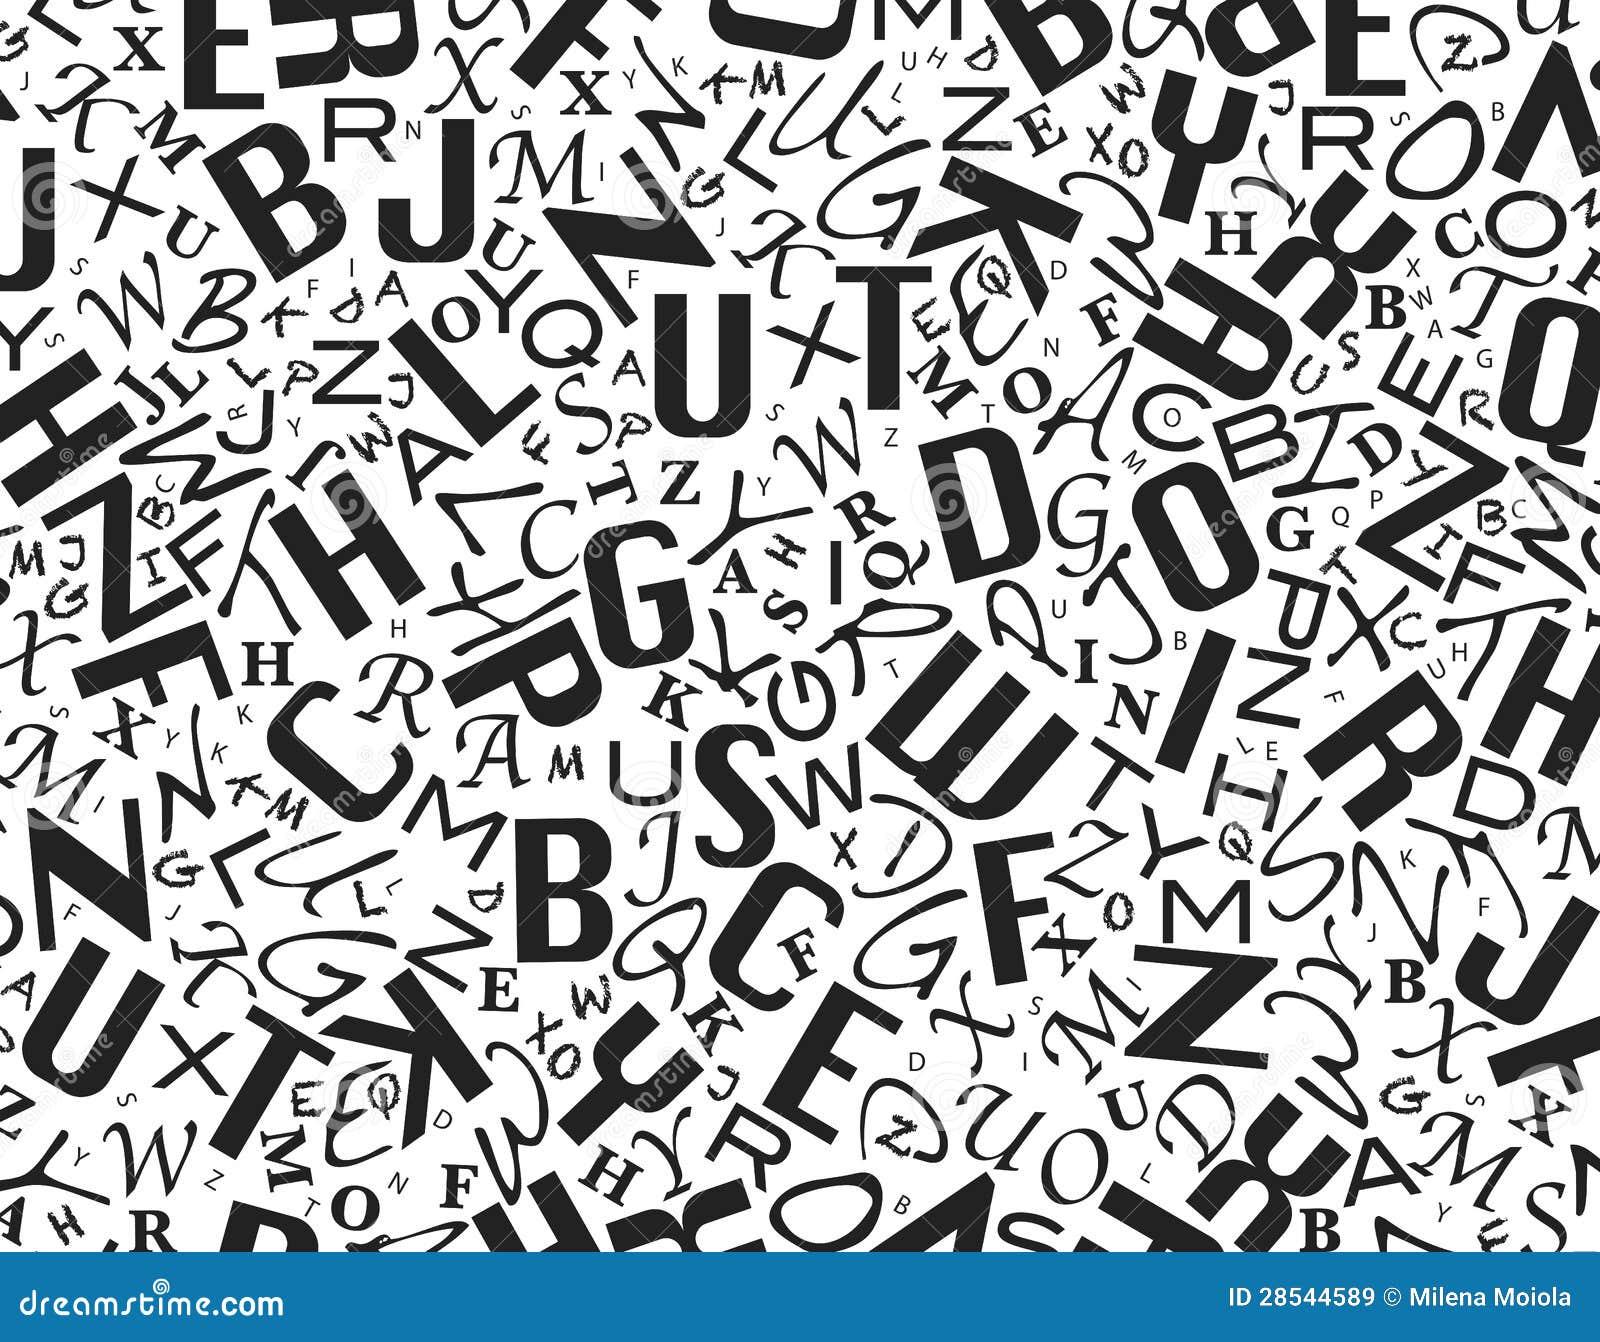 Alphabet background stock illustration illustration of communication 28544589 - T alphabet wallpaper hd ...